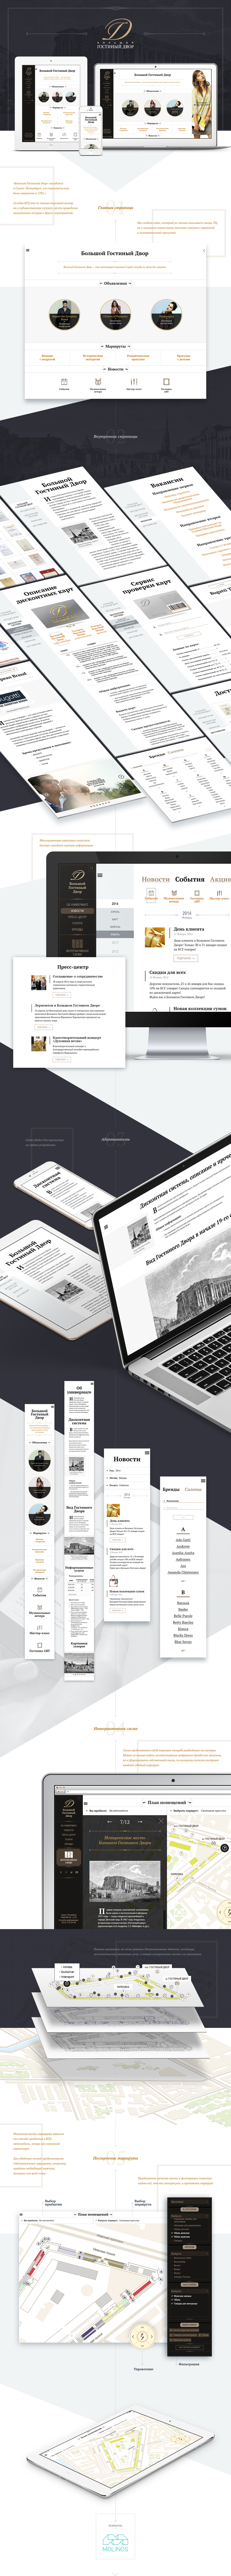 interactive,map,brands,BGD